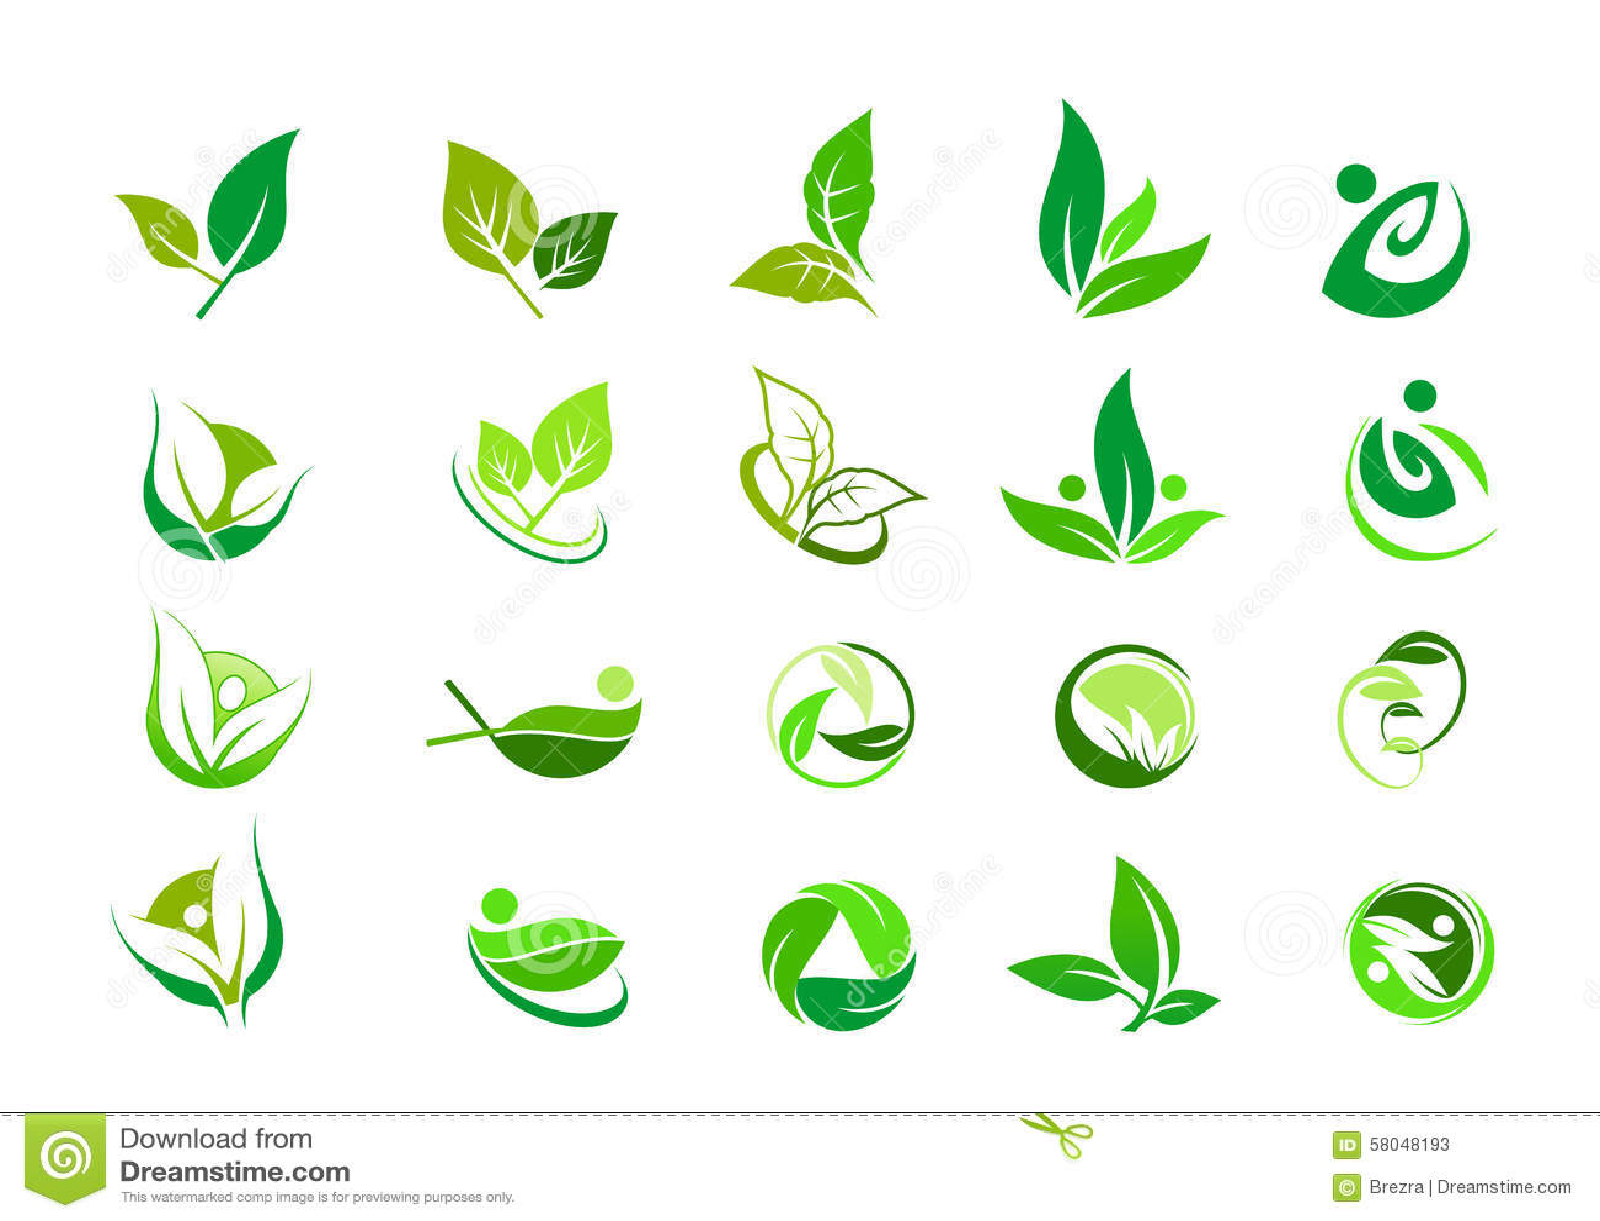 Blatt, Logo, organisch, Wellness, Leute, Anlage, Ökologie, Naturdesign-Ikonensatz